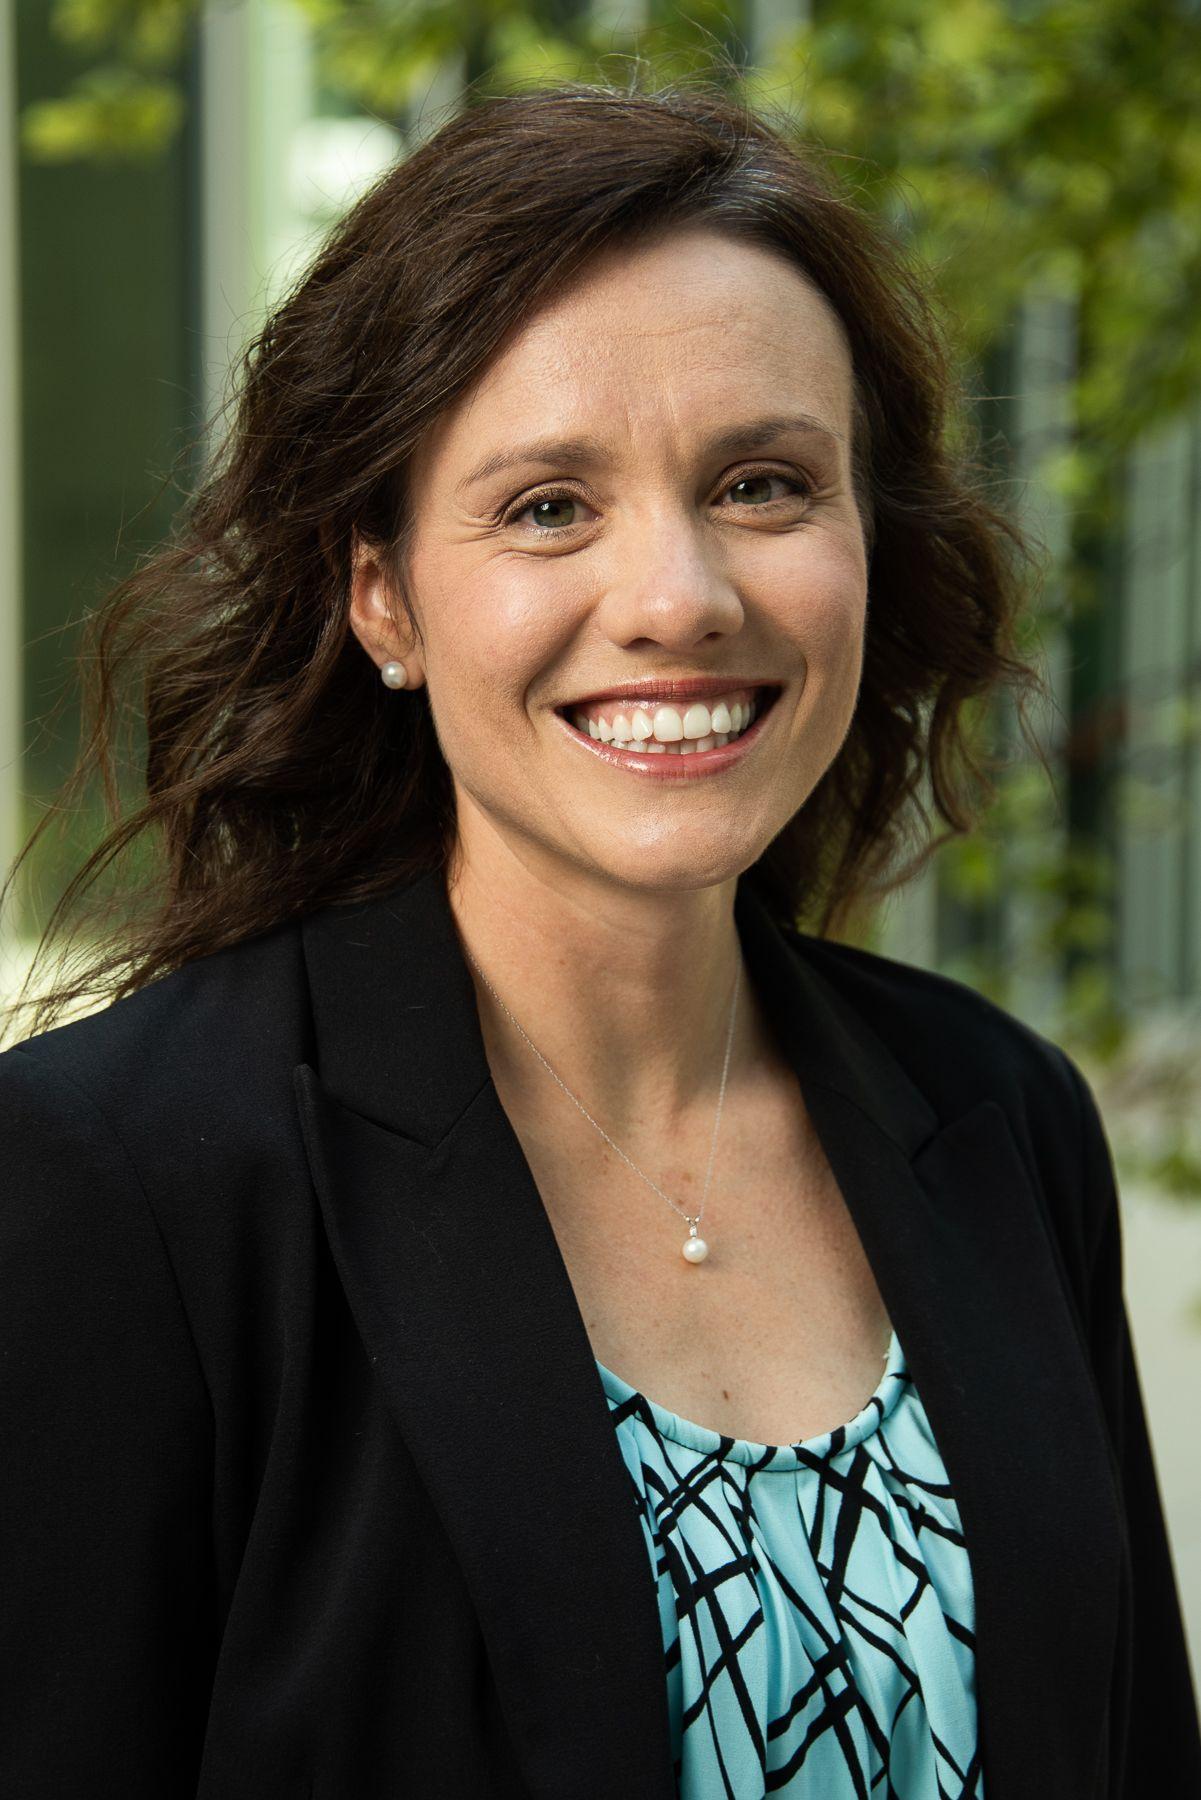 Christine Widman